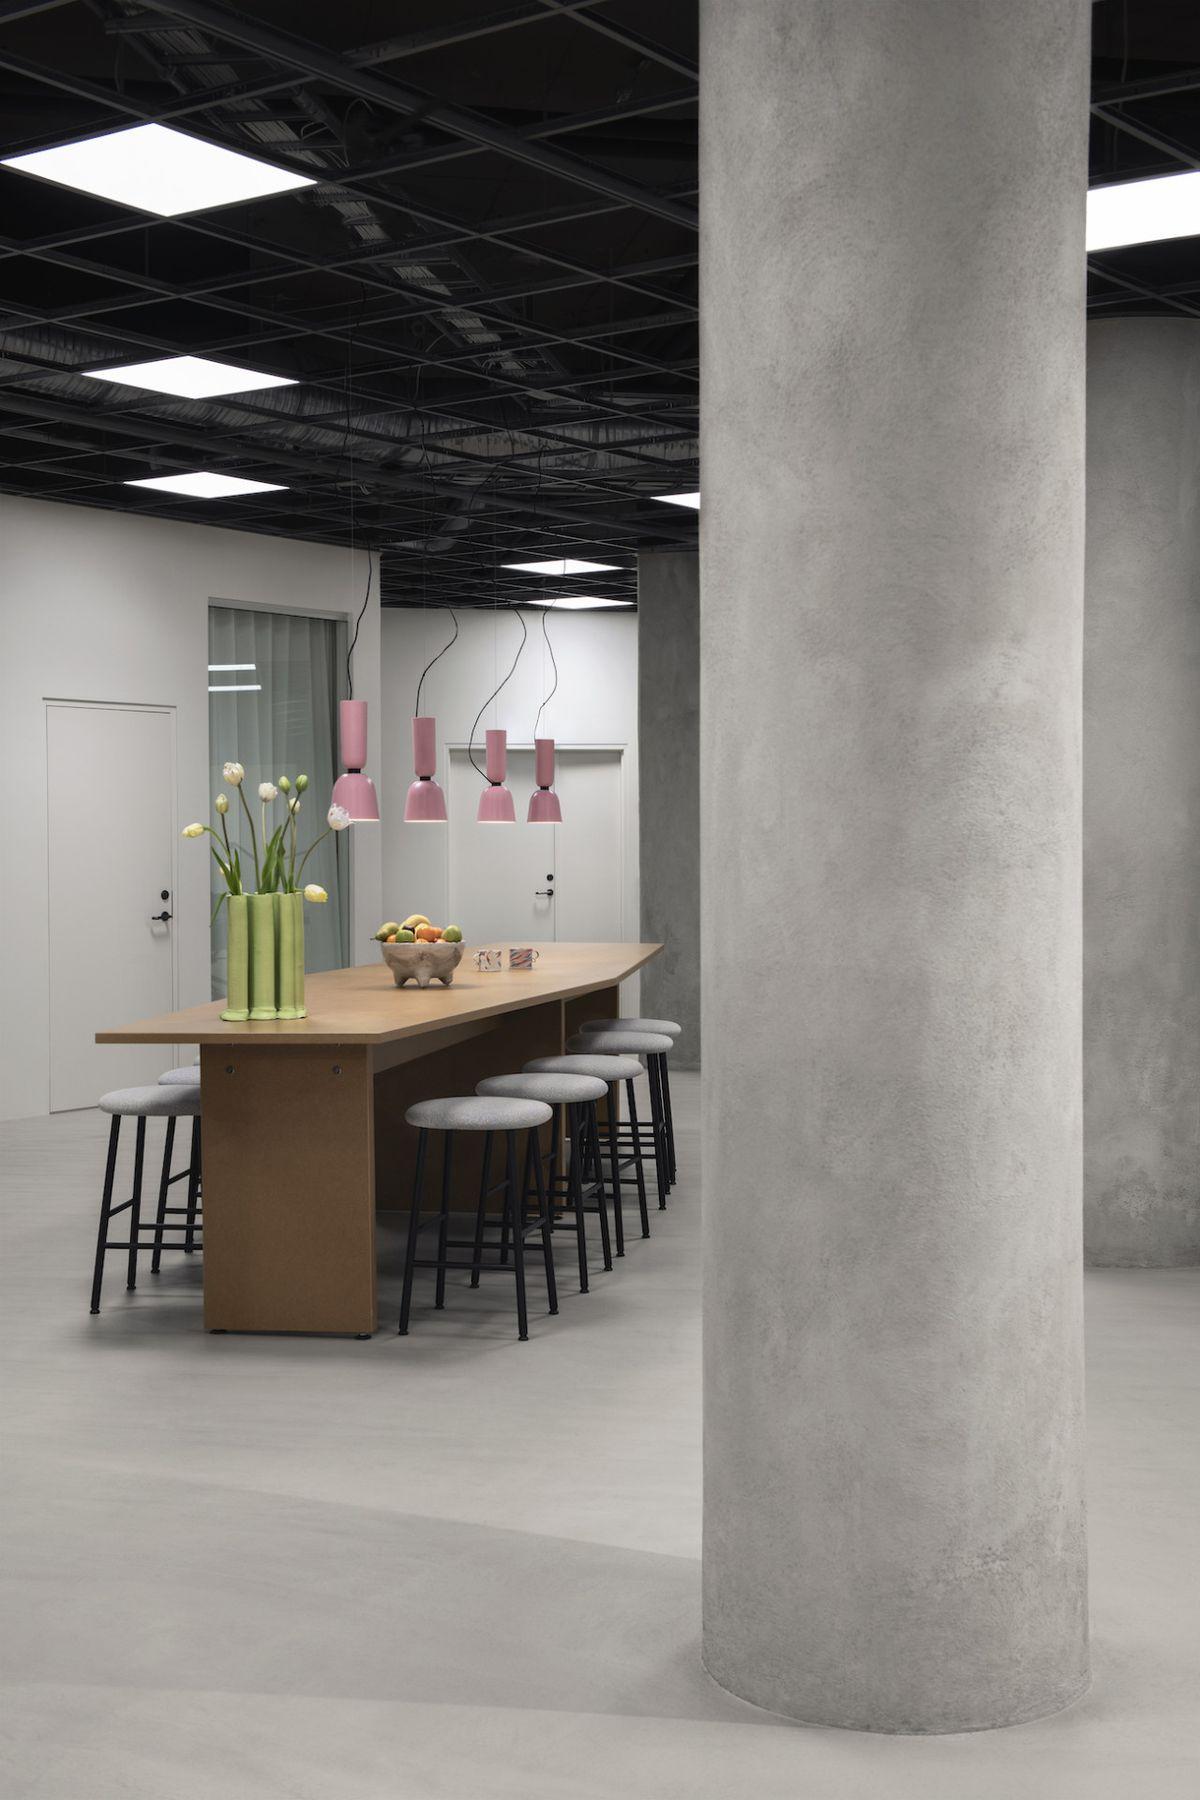 Hem Unveils New Stockholm HQ by Atelier Paul Vaugoyeau - Design Milk